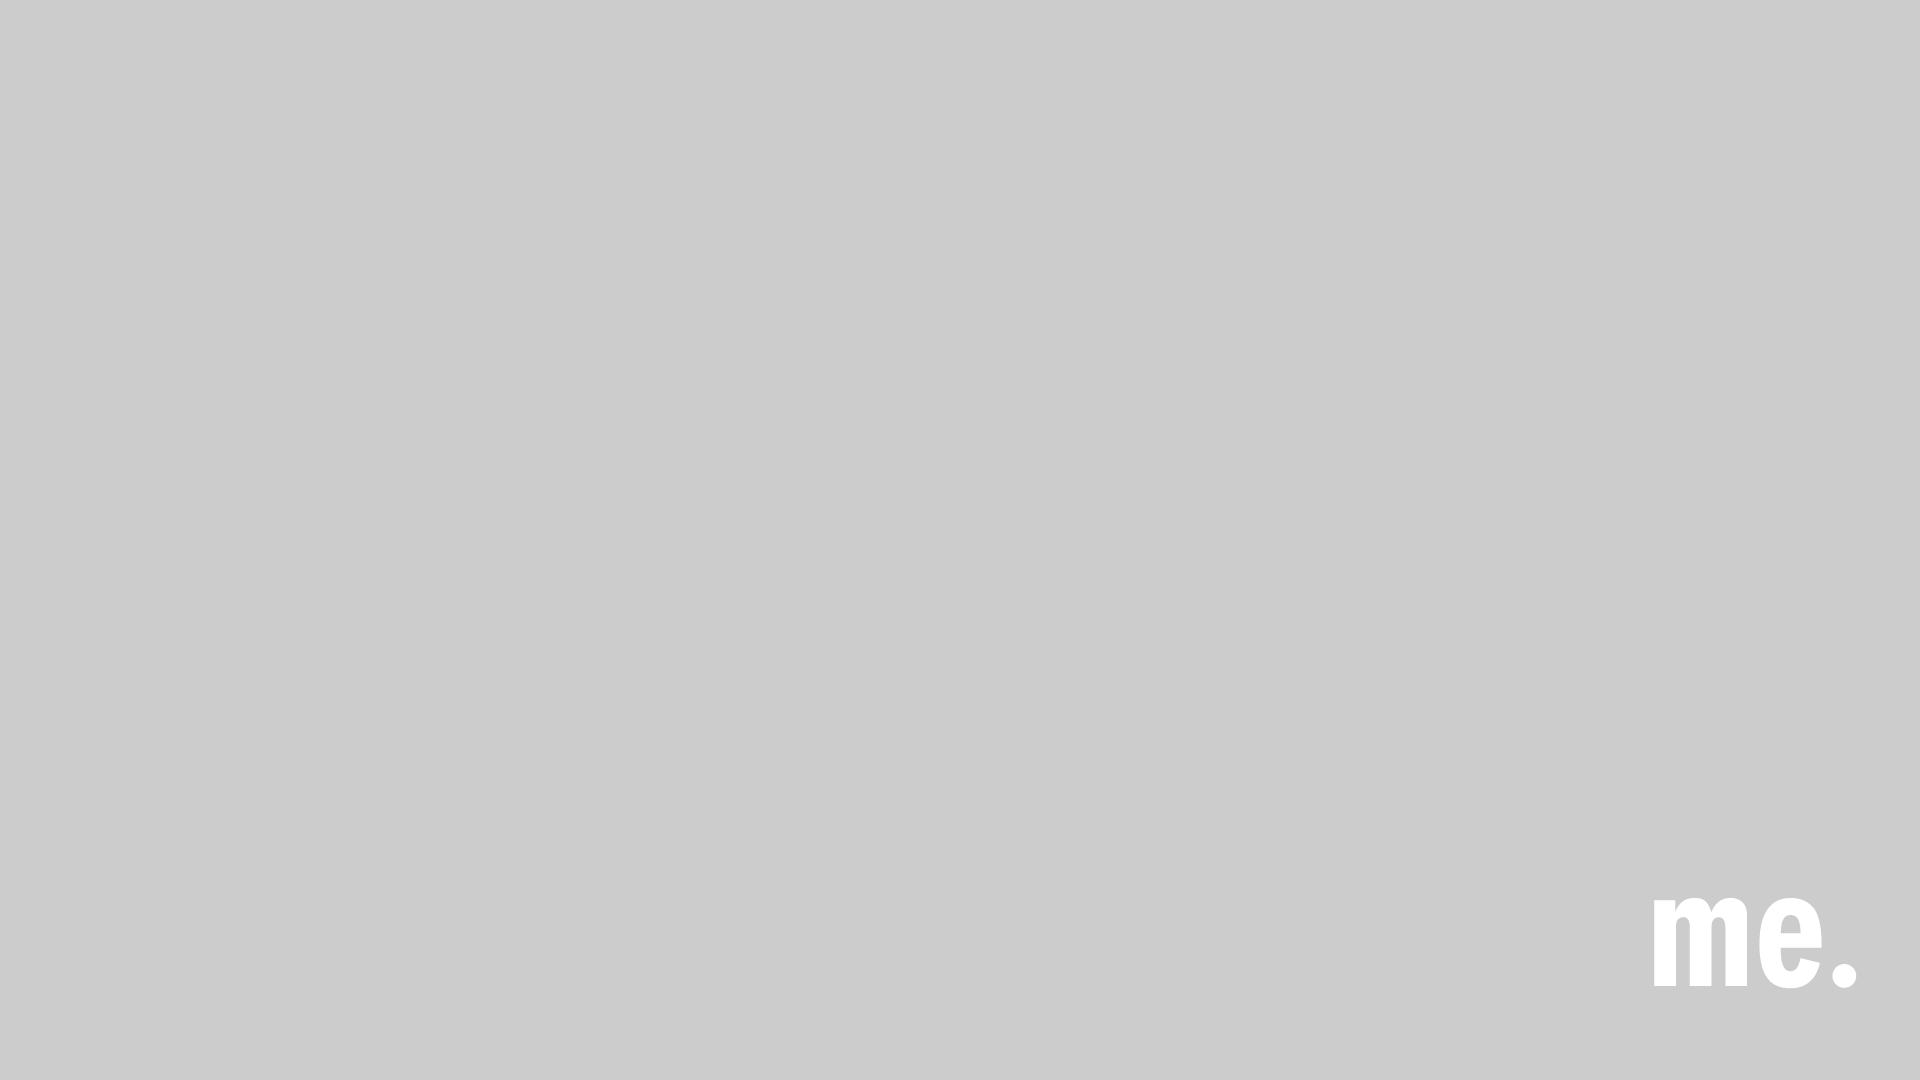 7. Birdman: 20 Millionen US-Dollar